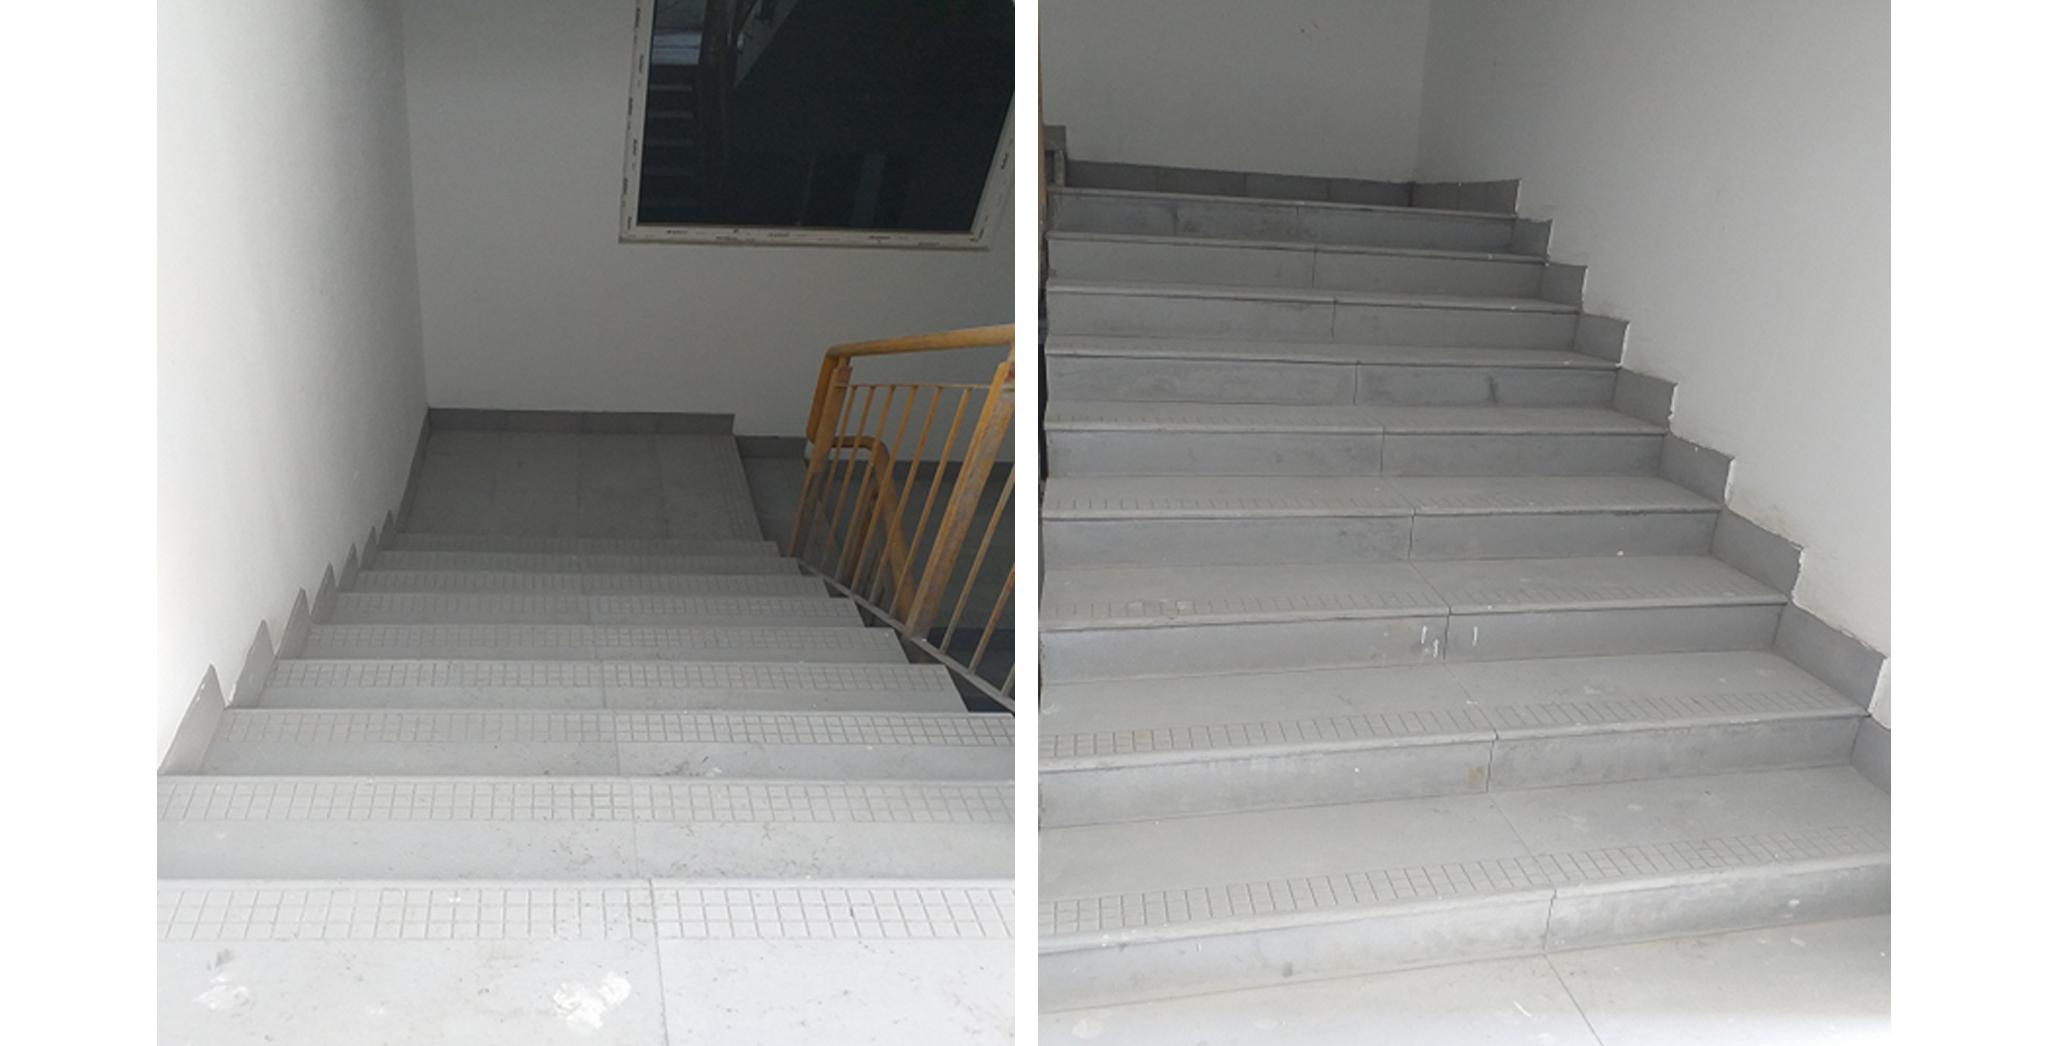 Aug 2021 - Block K, L & M: Staircase Flooring Works in progress